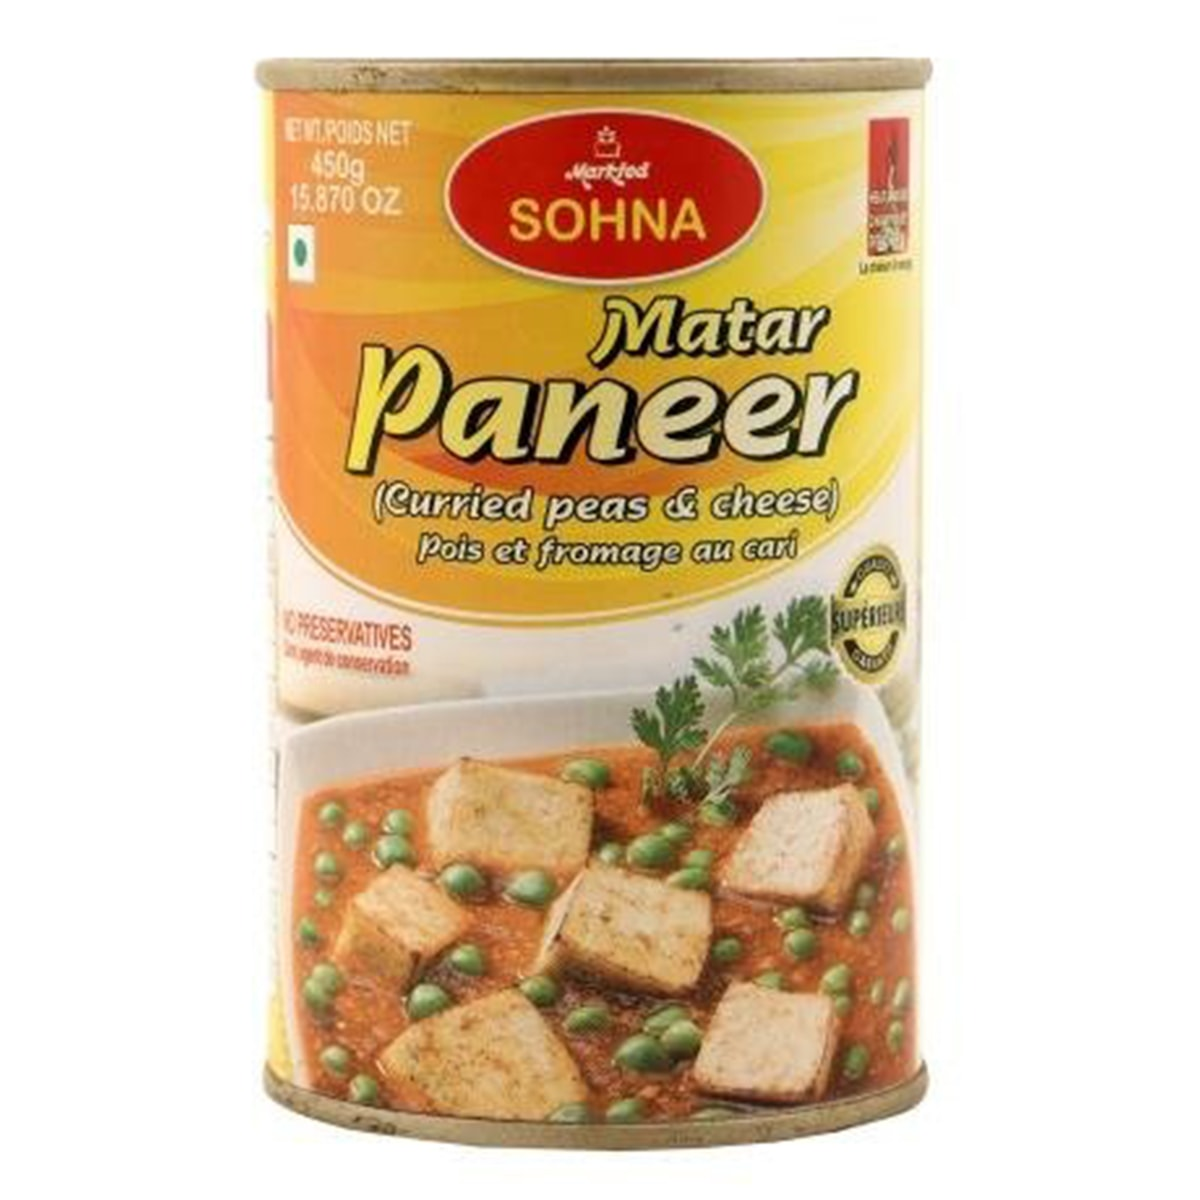 Buy Markfed Sohna Matar Paneer (Peas and Cheese Curried) - 450 gm